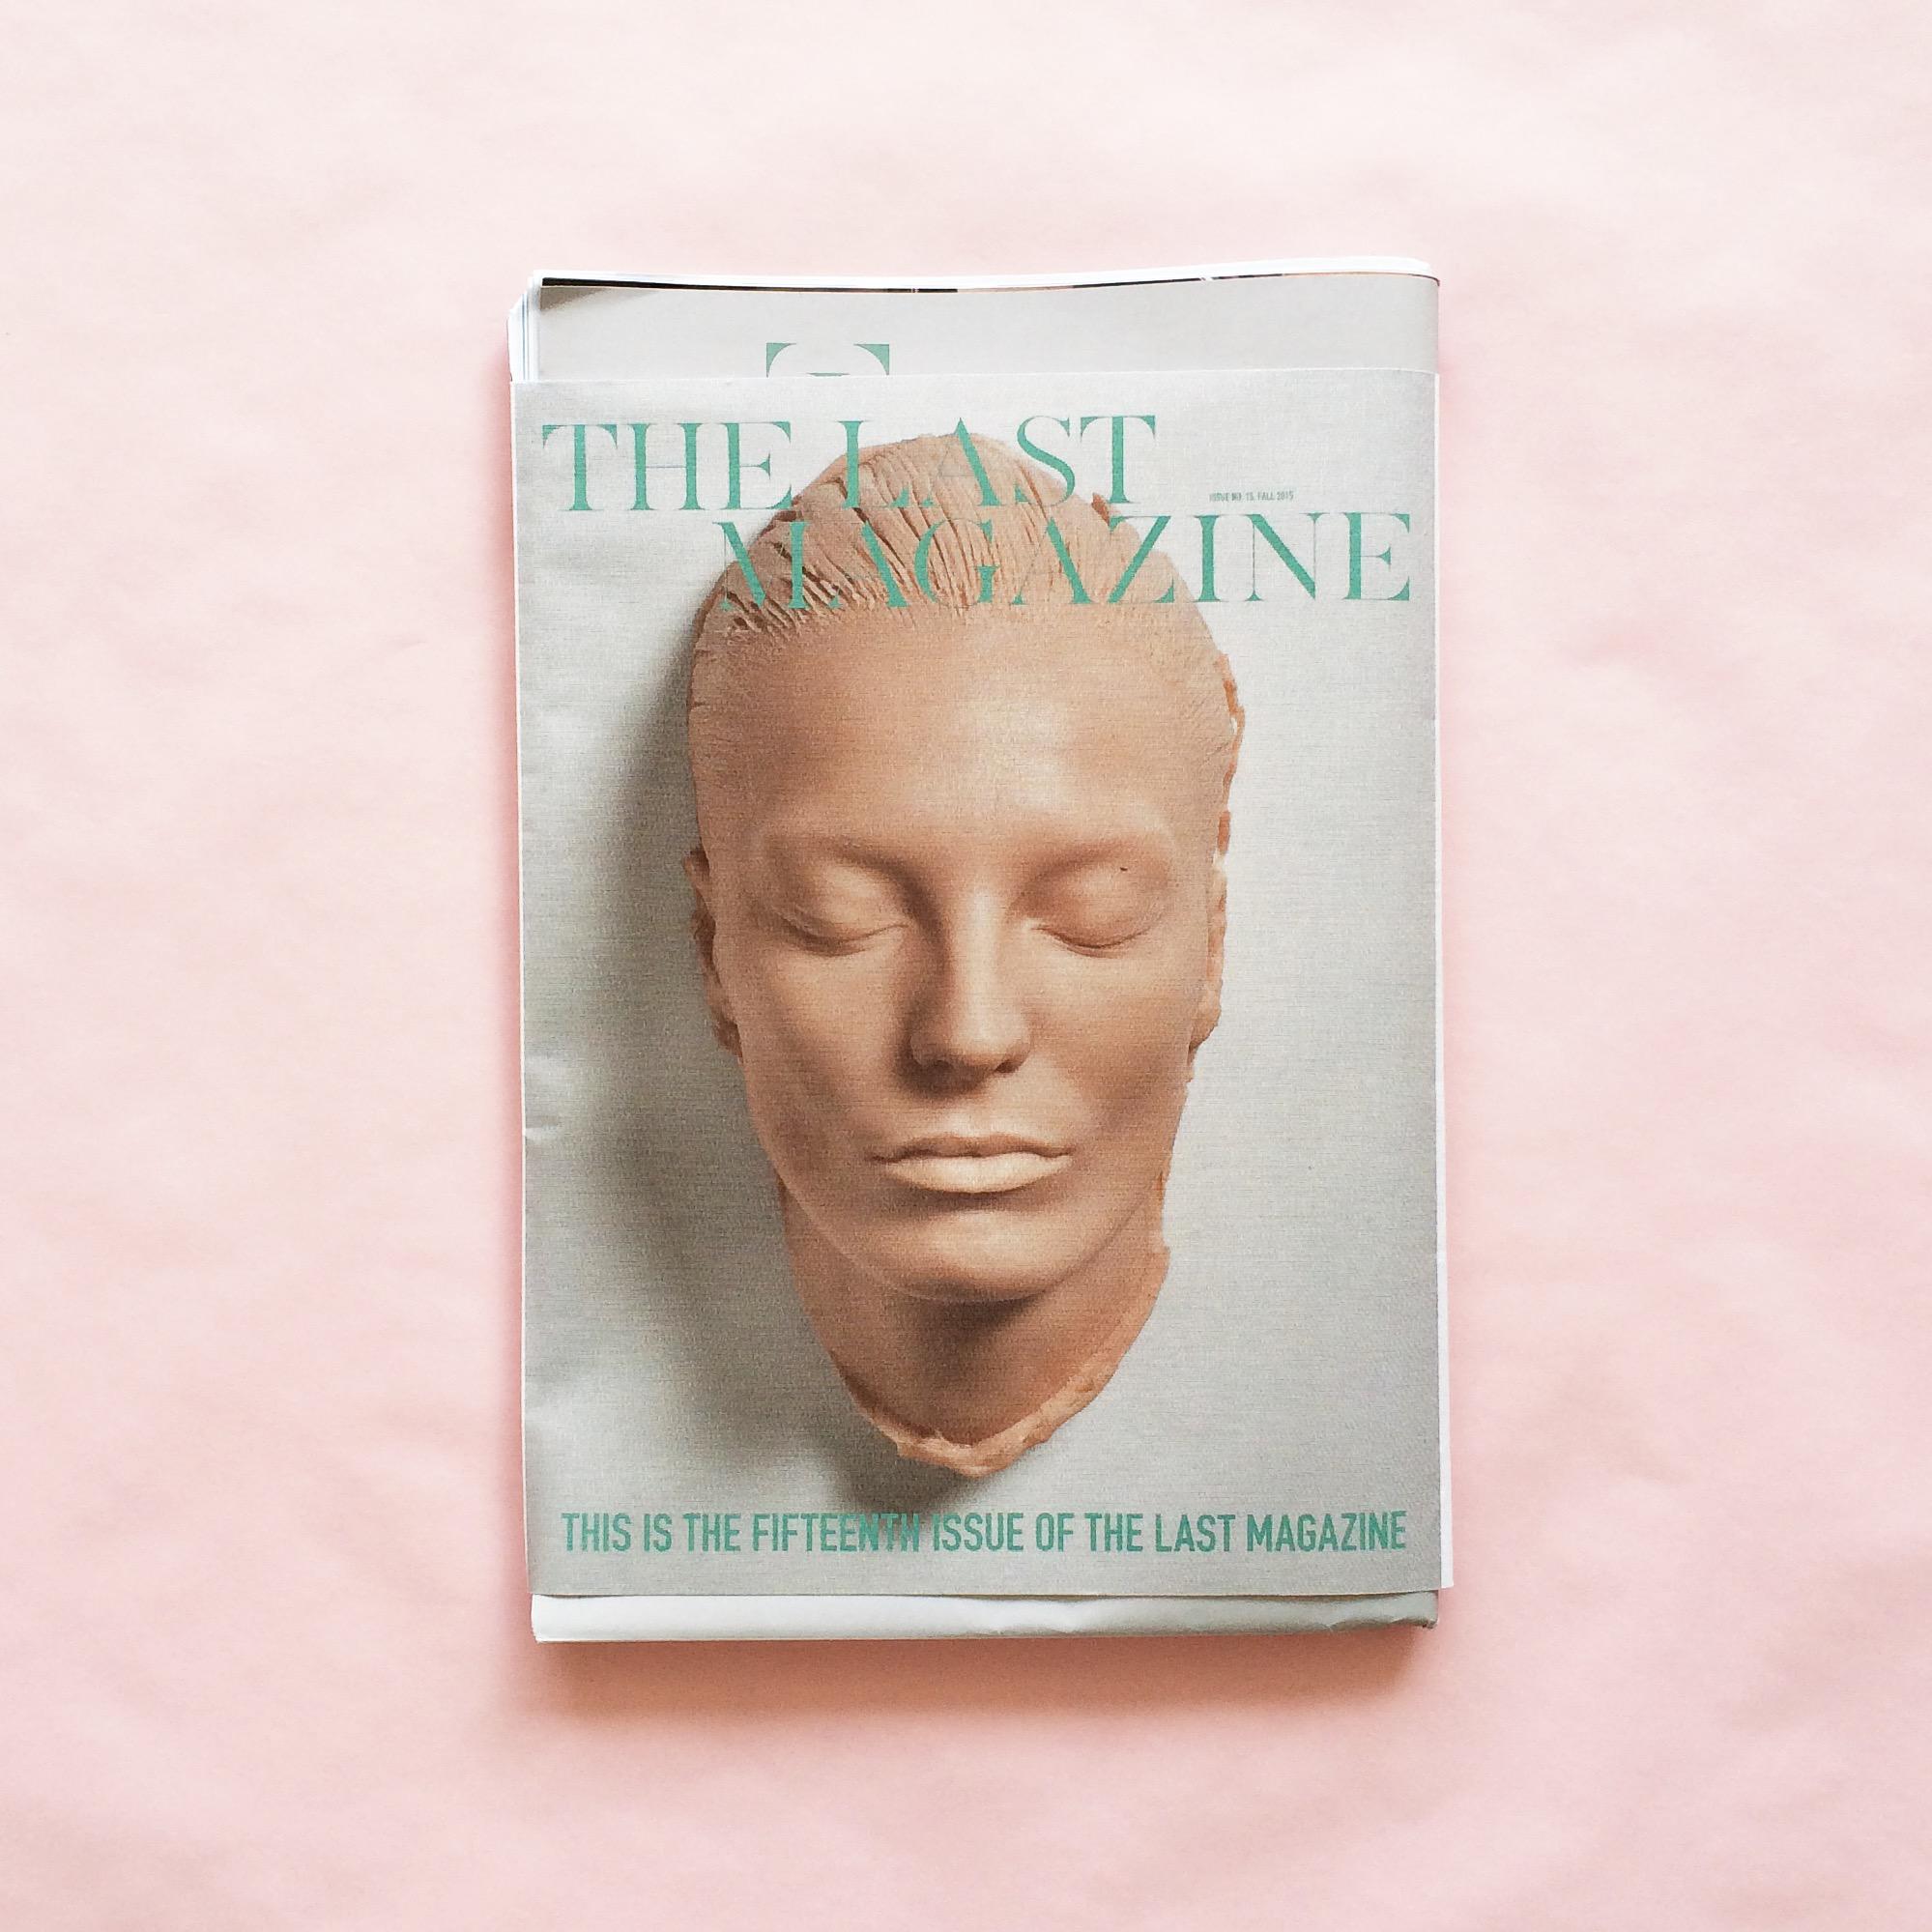 Bodega LTD - The Last Magazine (2)